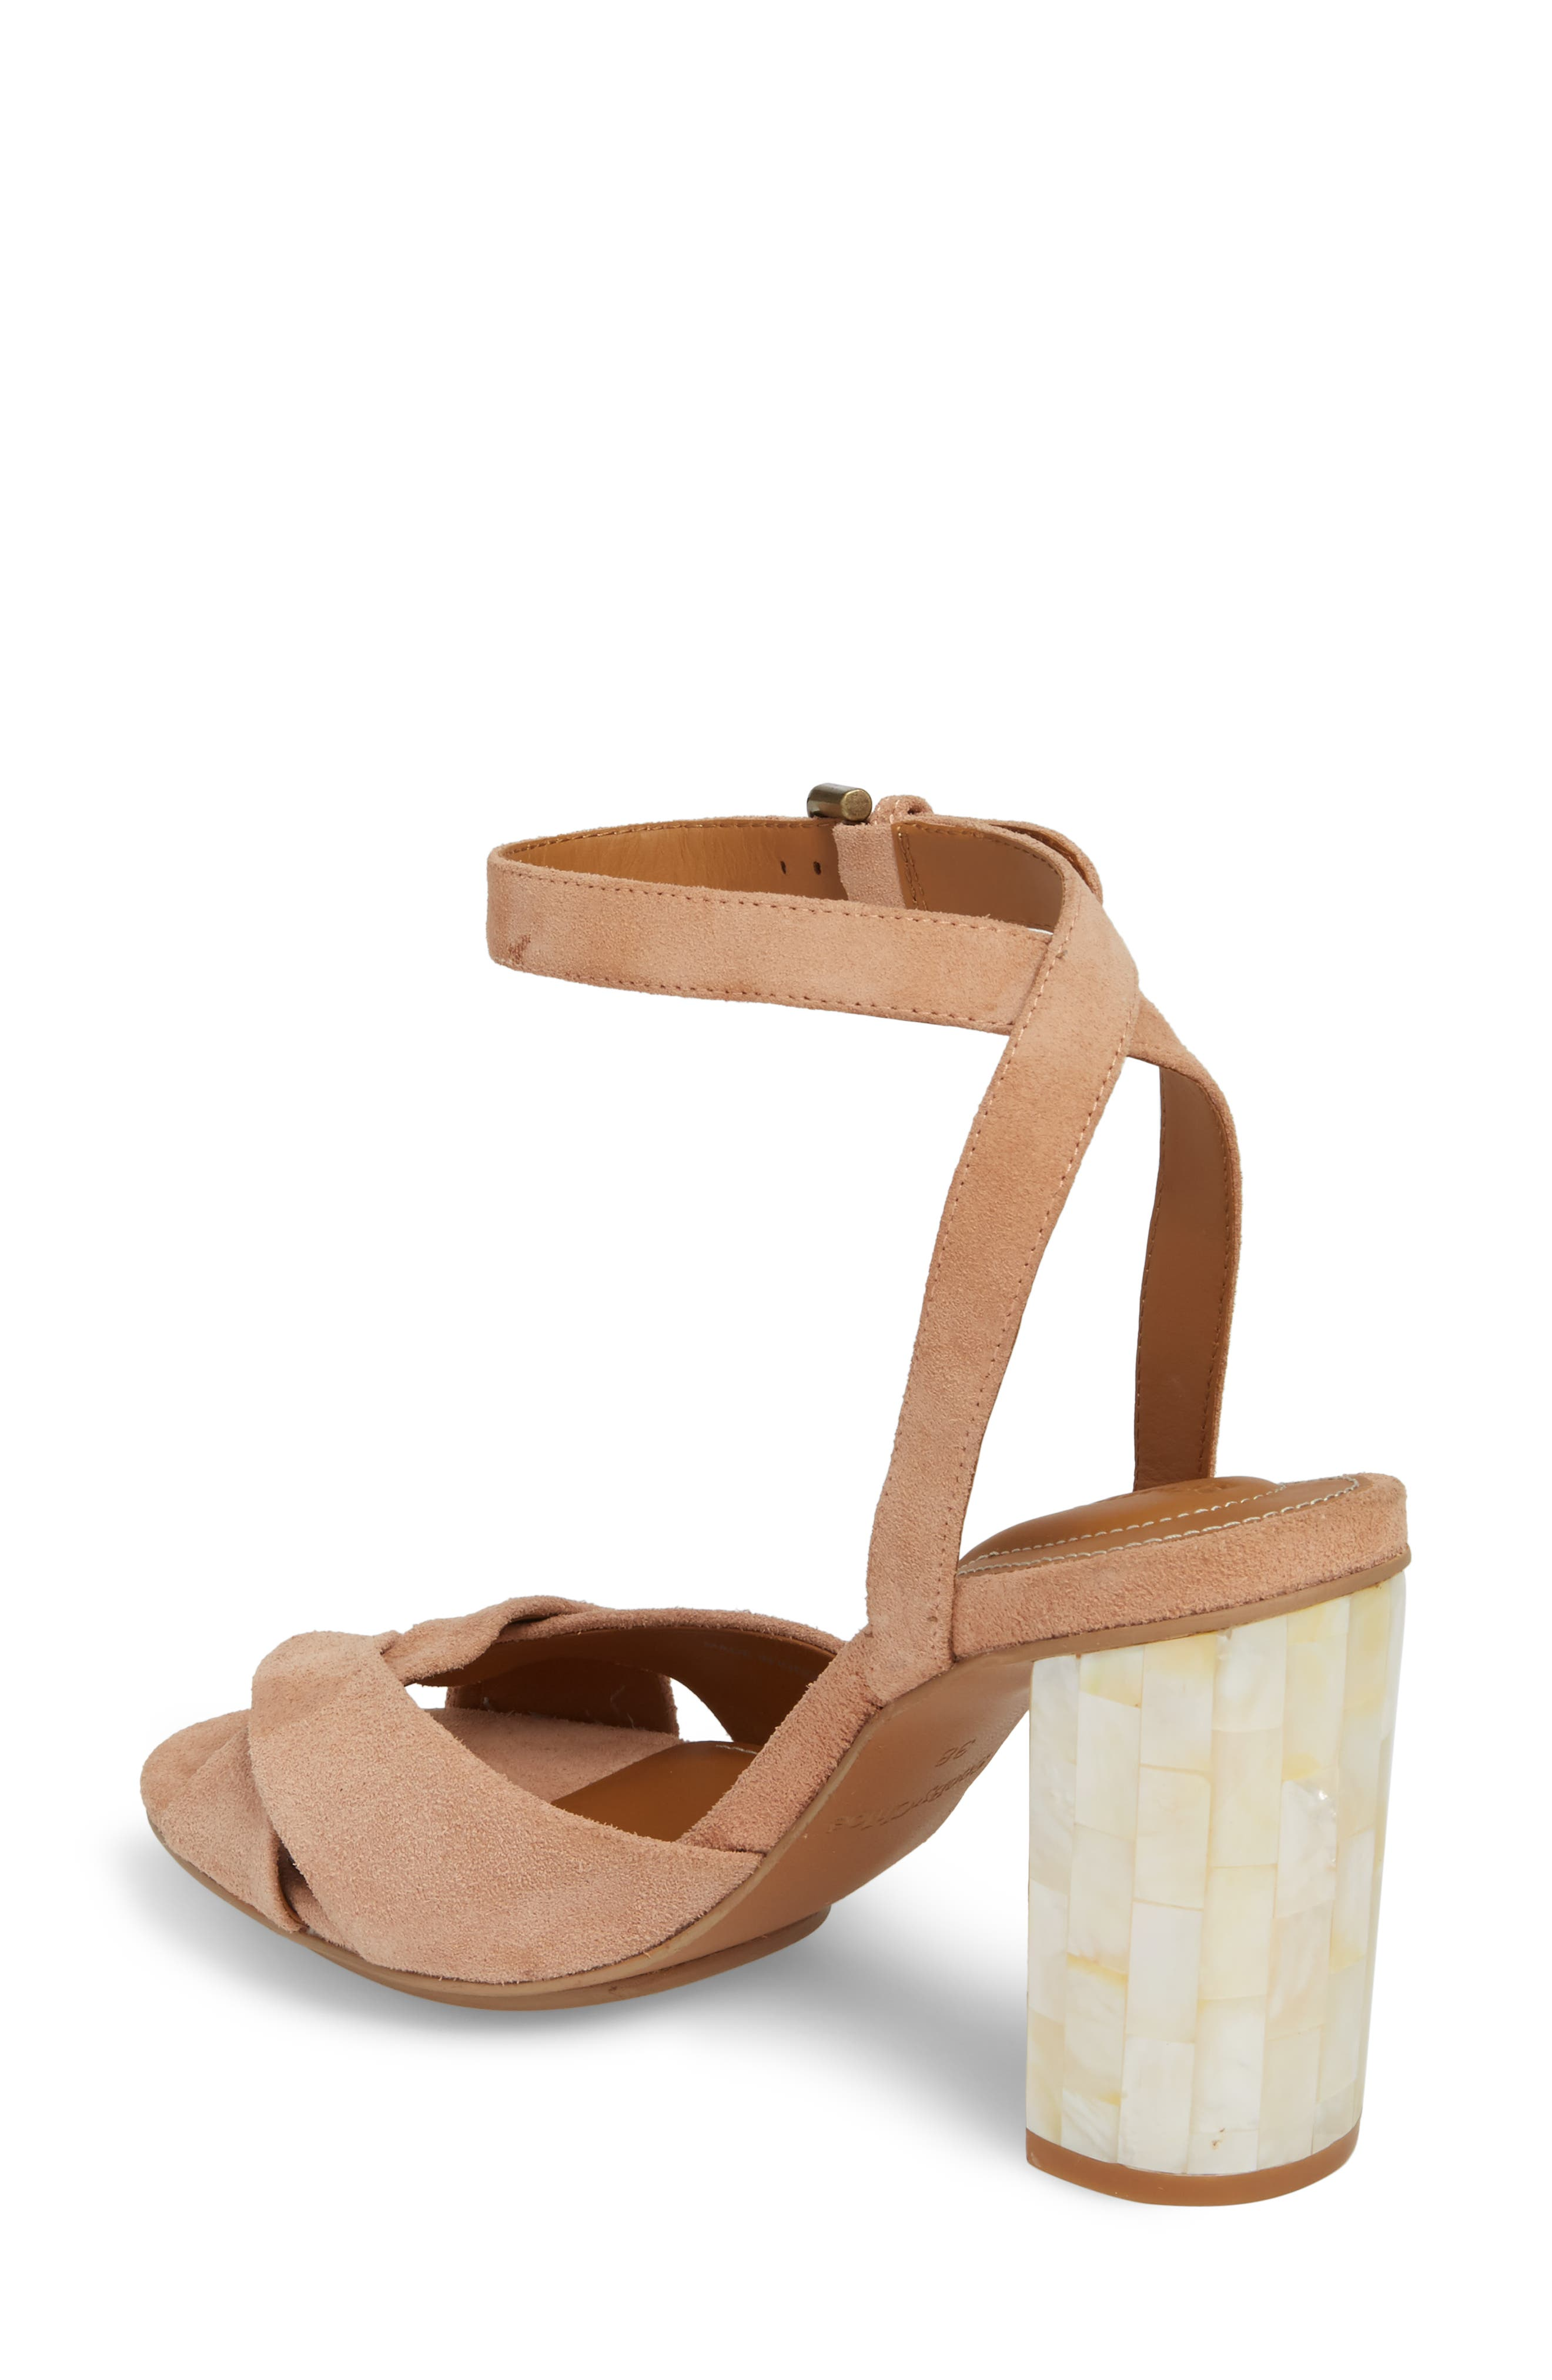 Isida Block Heel Sandal,                             Alternate thumbnail 2, color,                             Cipria